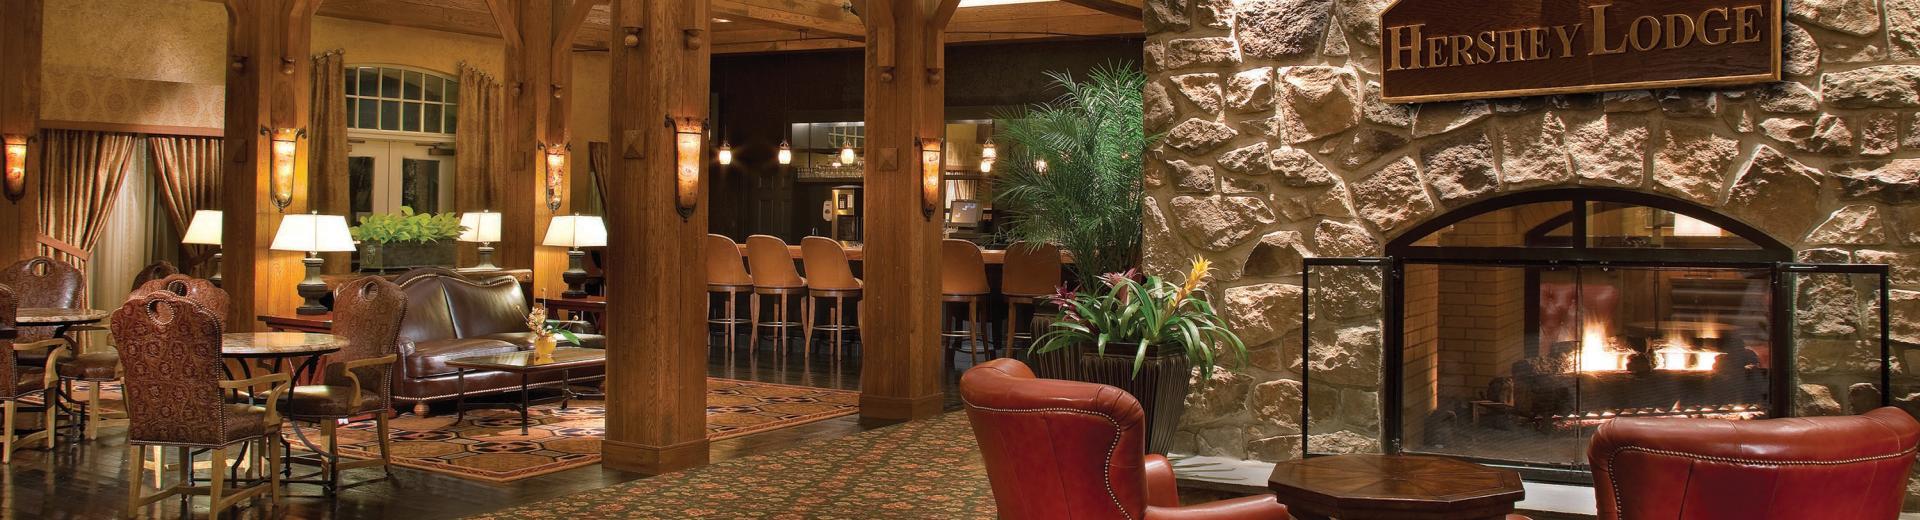 Hotels Hershey